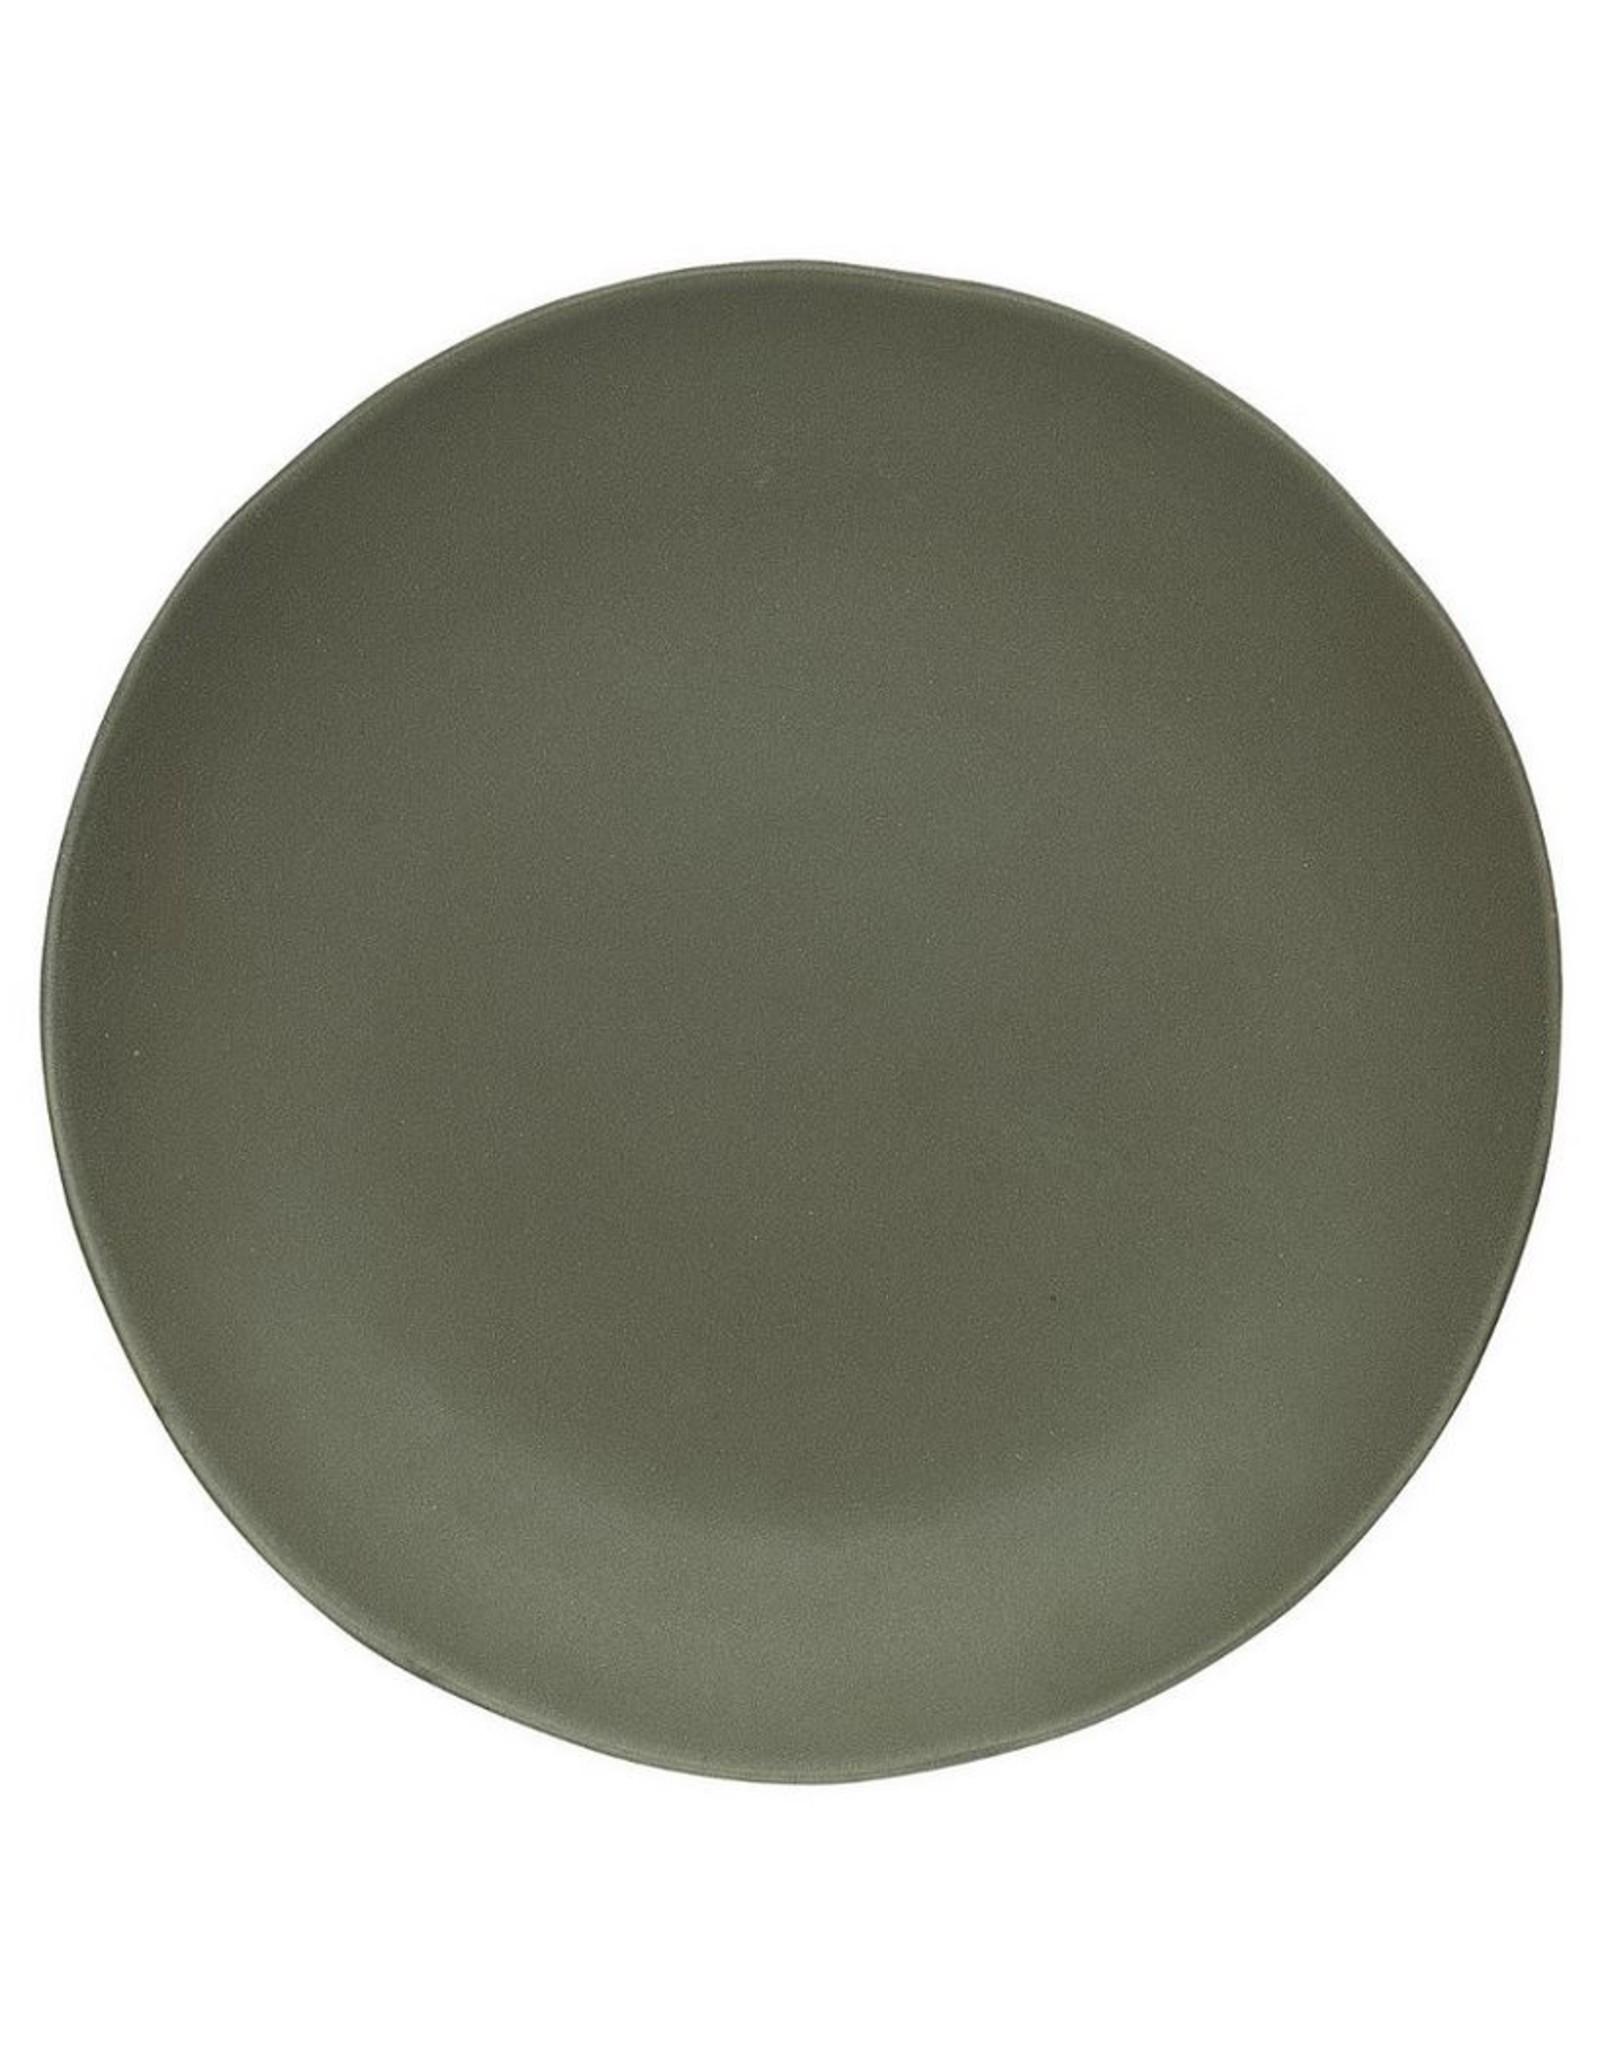 Ecology Sahara Dinner Plate Palm 27cm